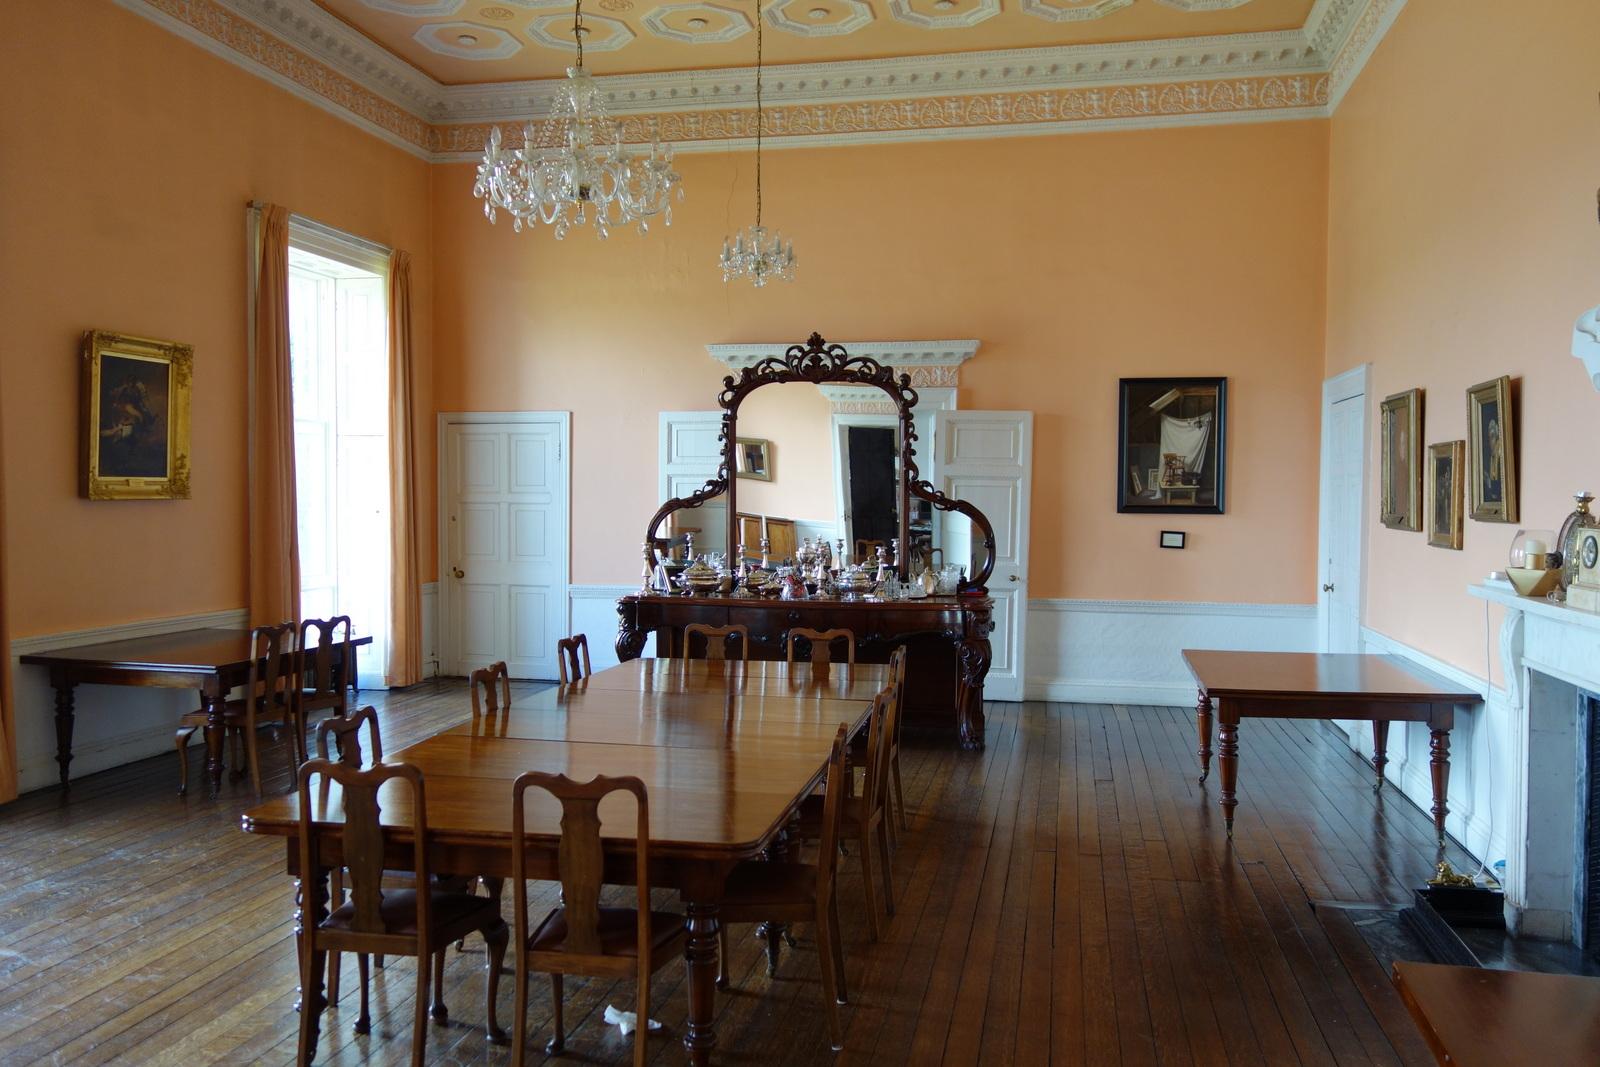 FileStaff Dining Room Clongowes Wood College Kildare